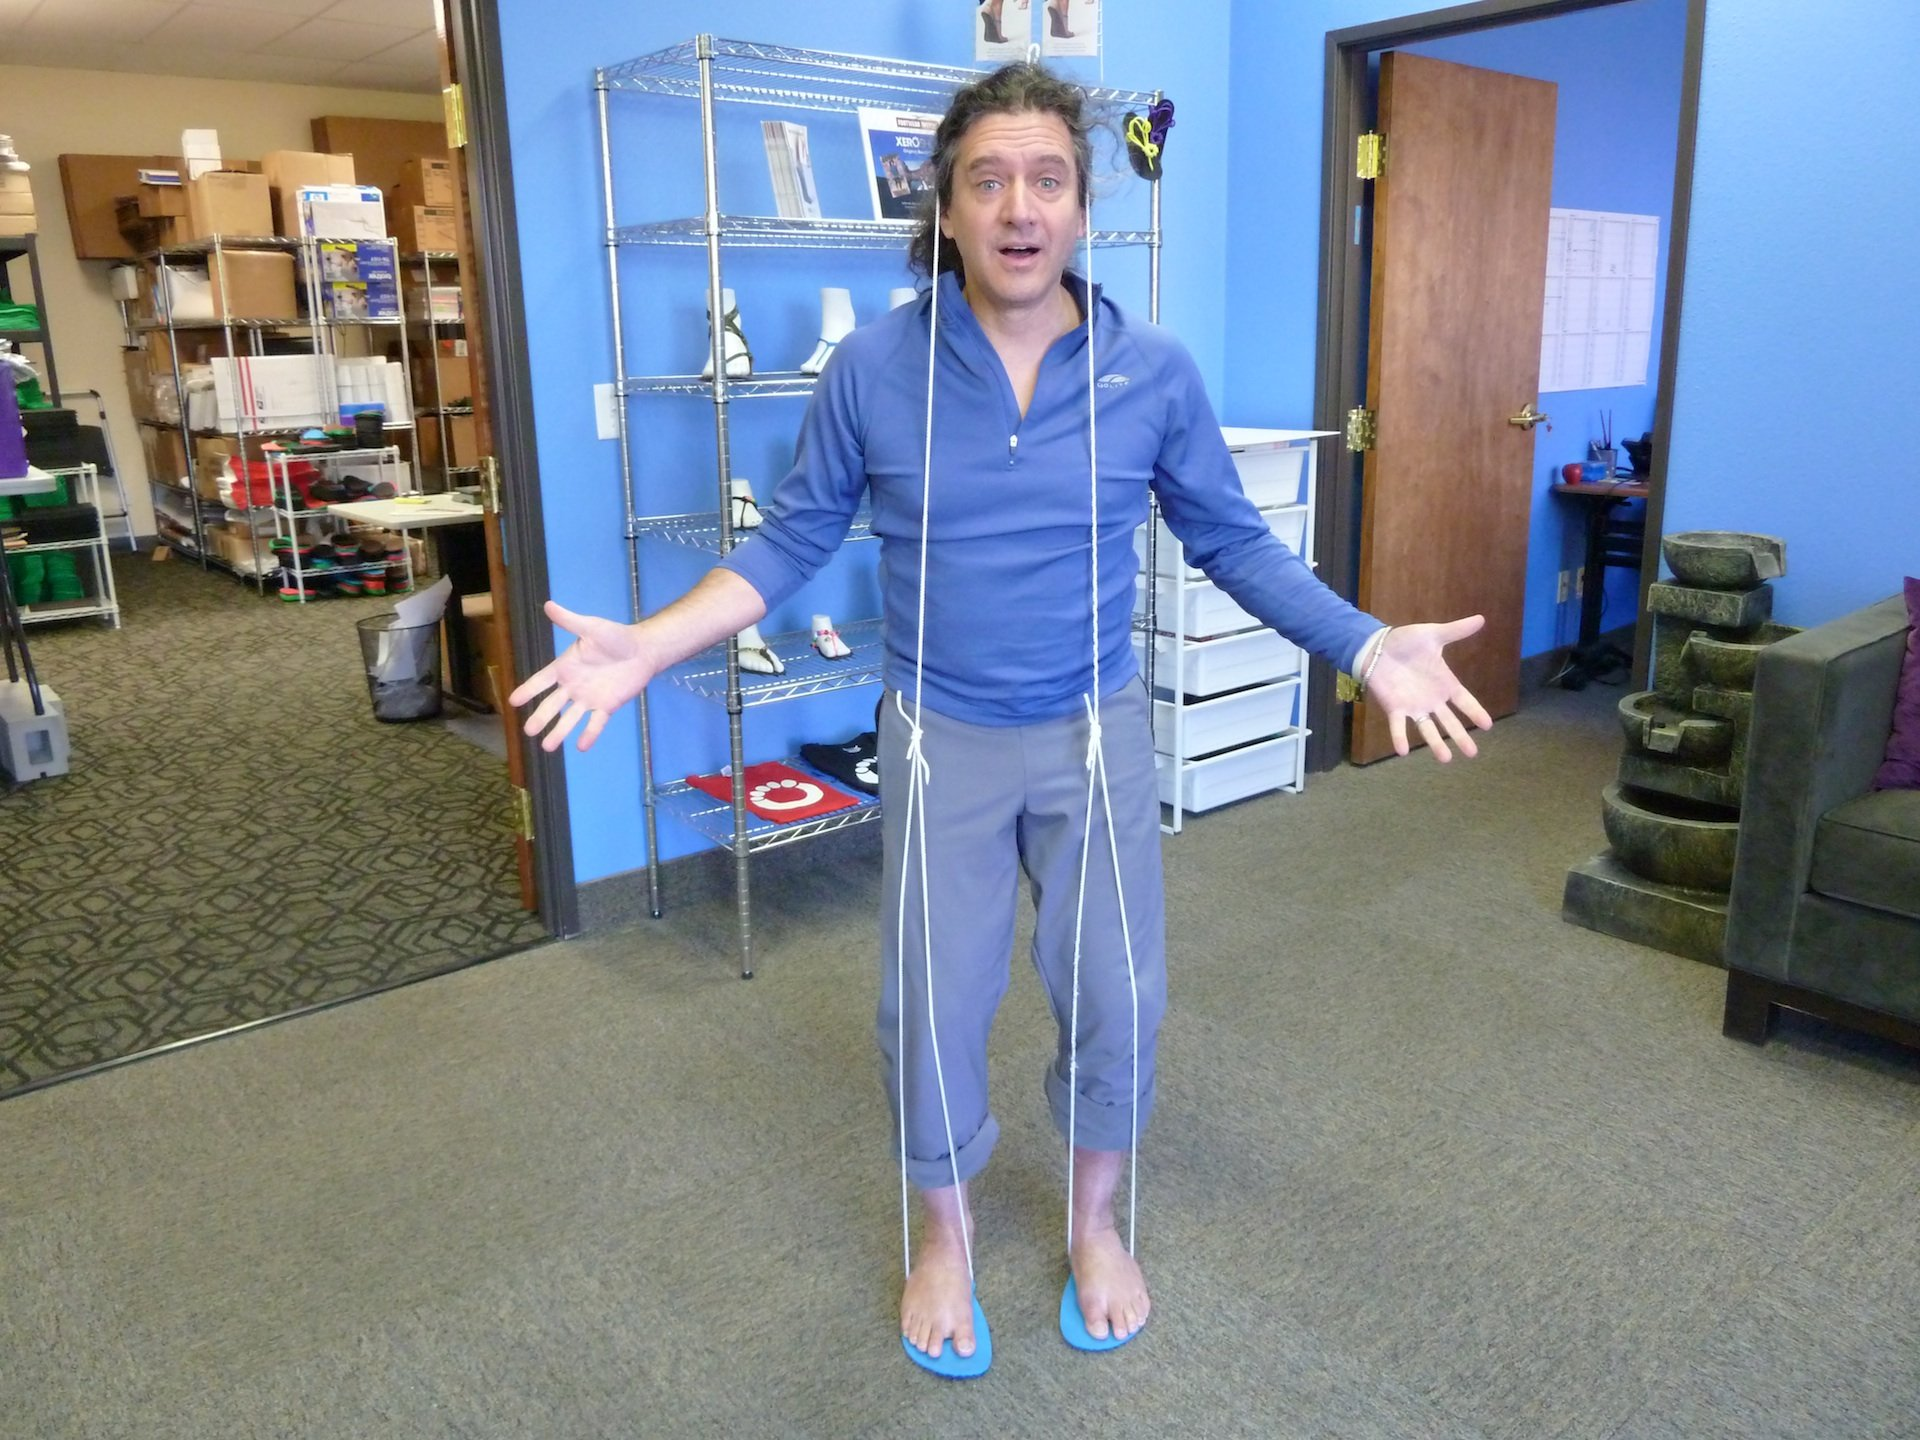 A new huarache sandal tying style